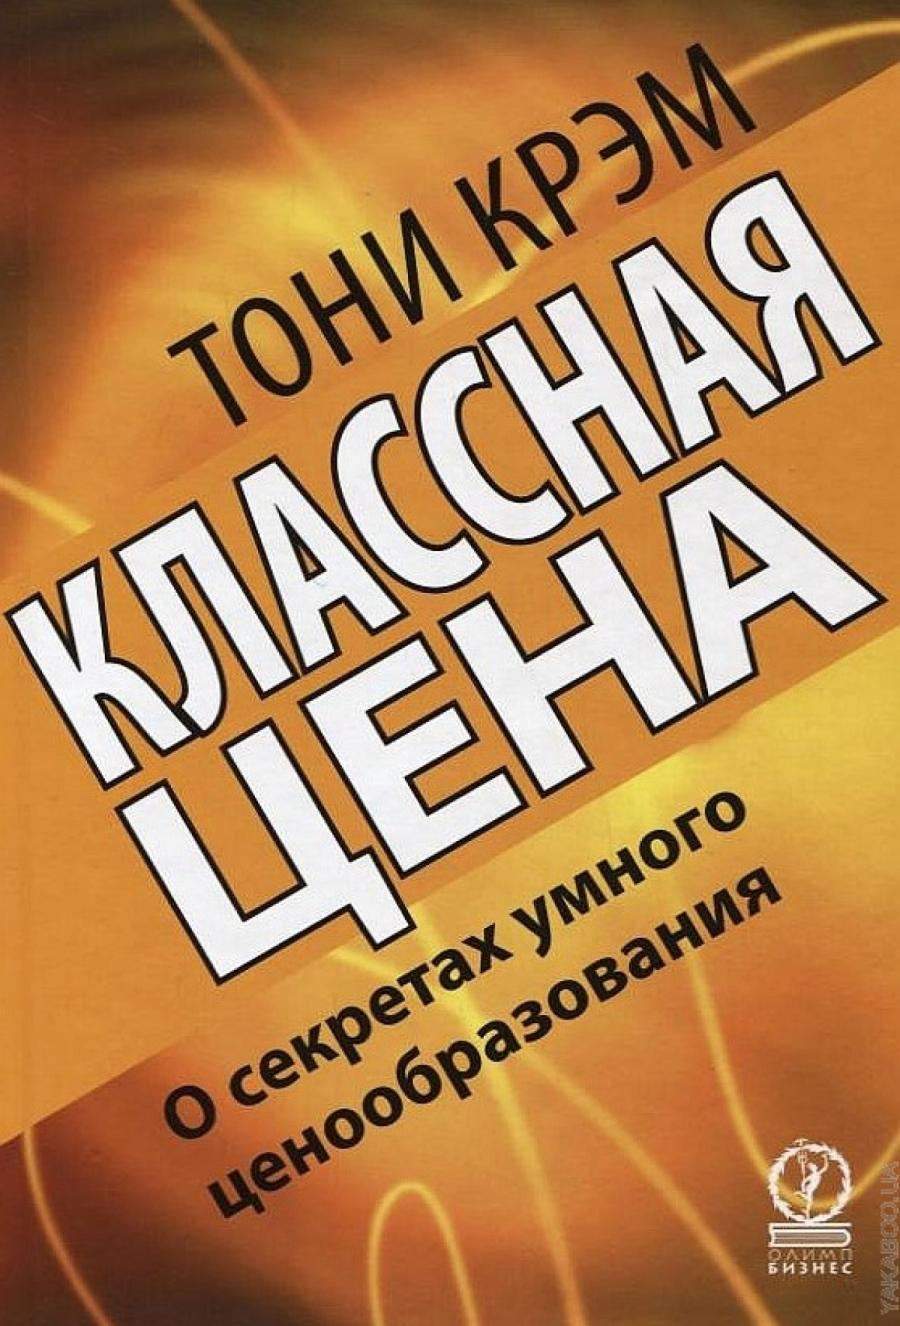 Обложка книги:  тони крэм - классная цена. о секретах умного ценообразования